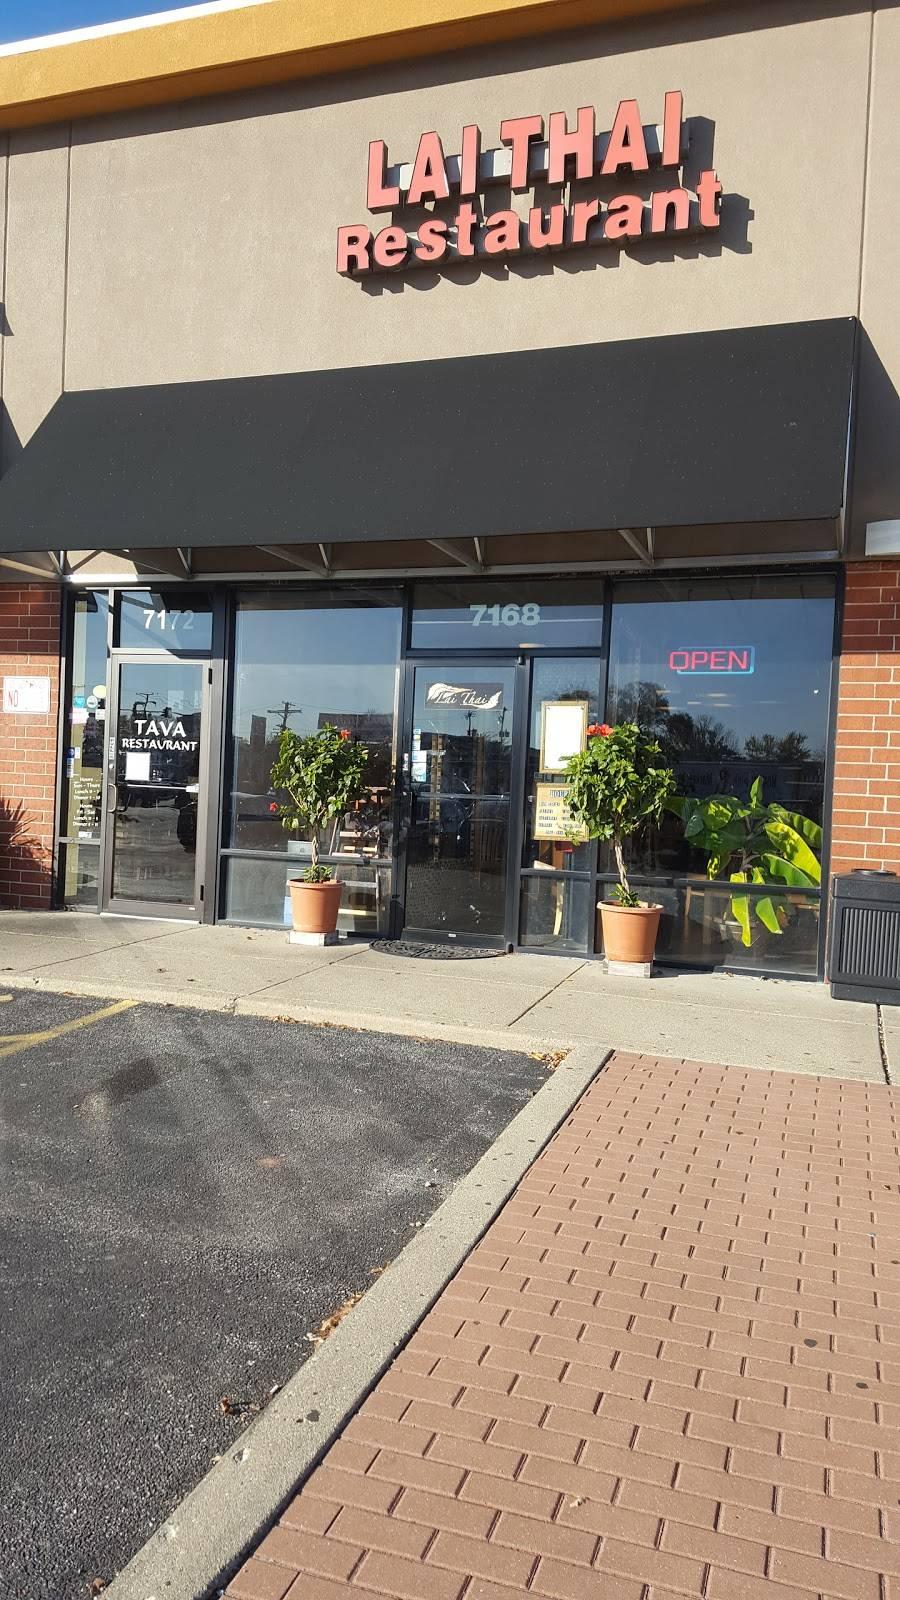 Lai Thai Restaurant | restaurant | 7168 Dempster Street, Morton Grove, IL 60053, USA | 8479668216 OR +1 847-966-8216